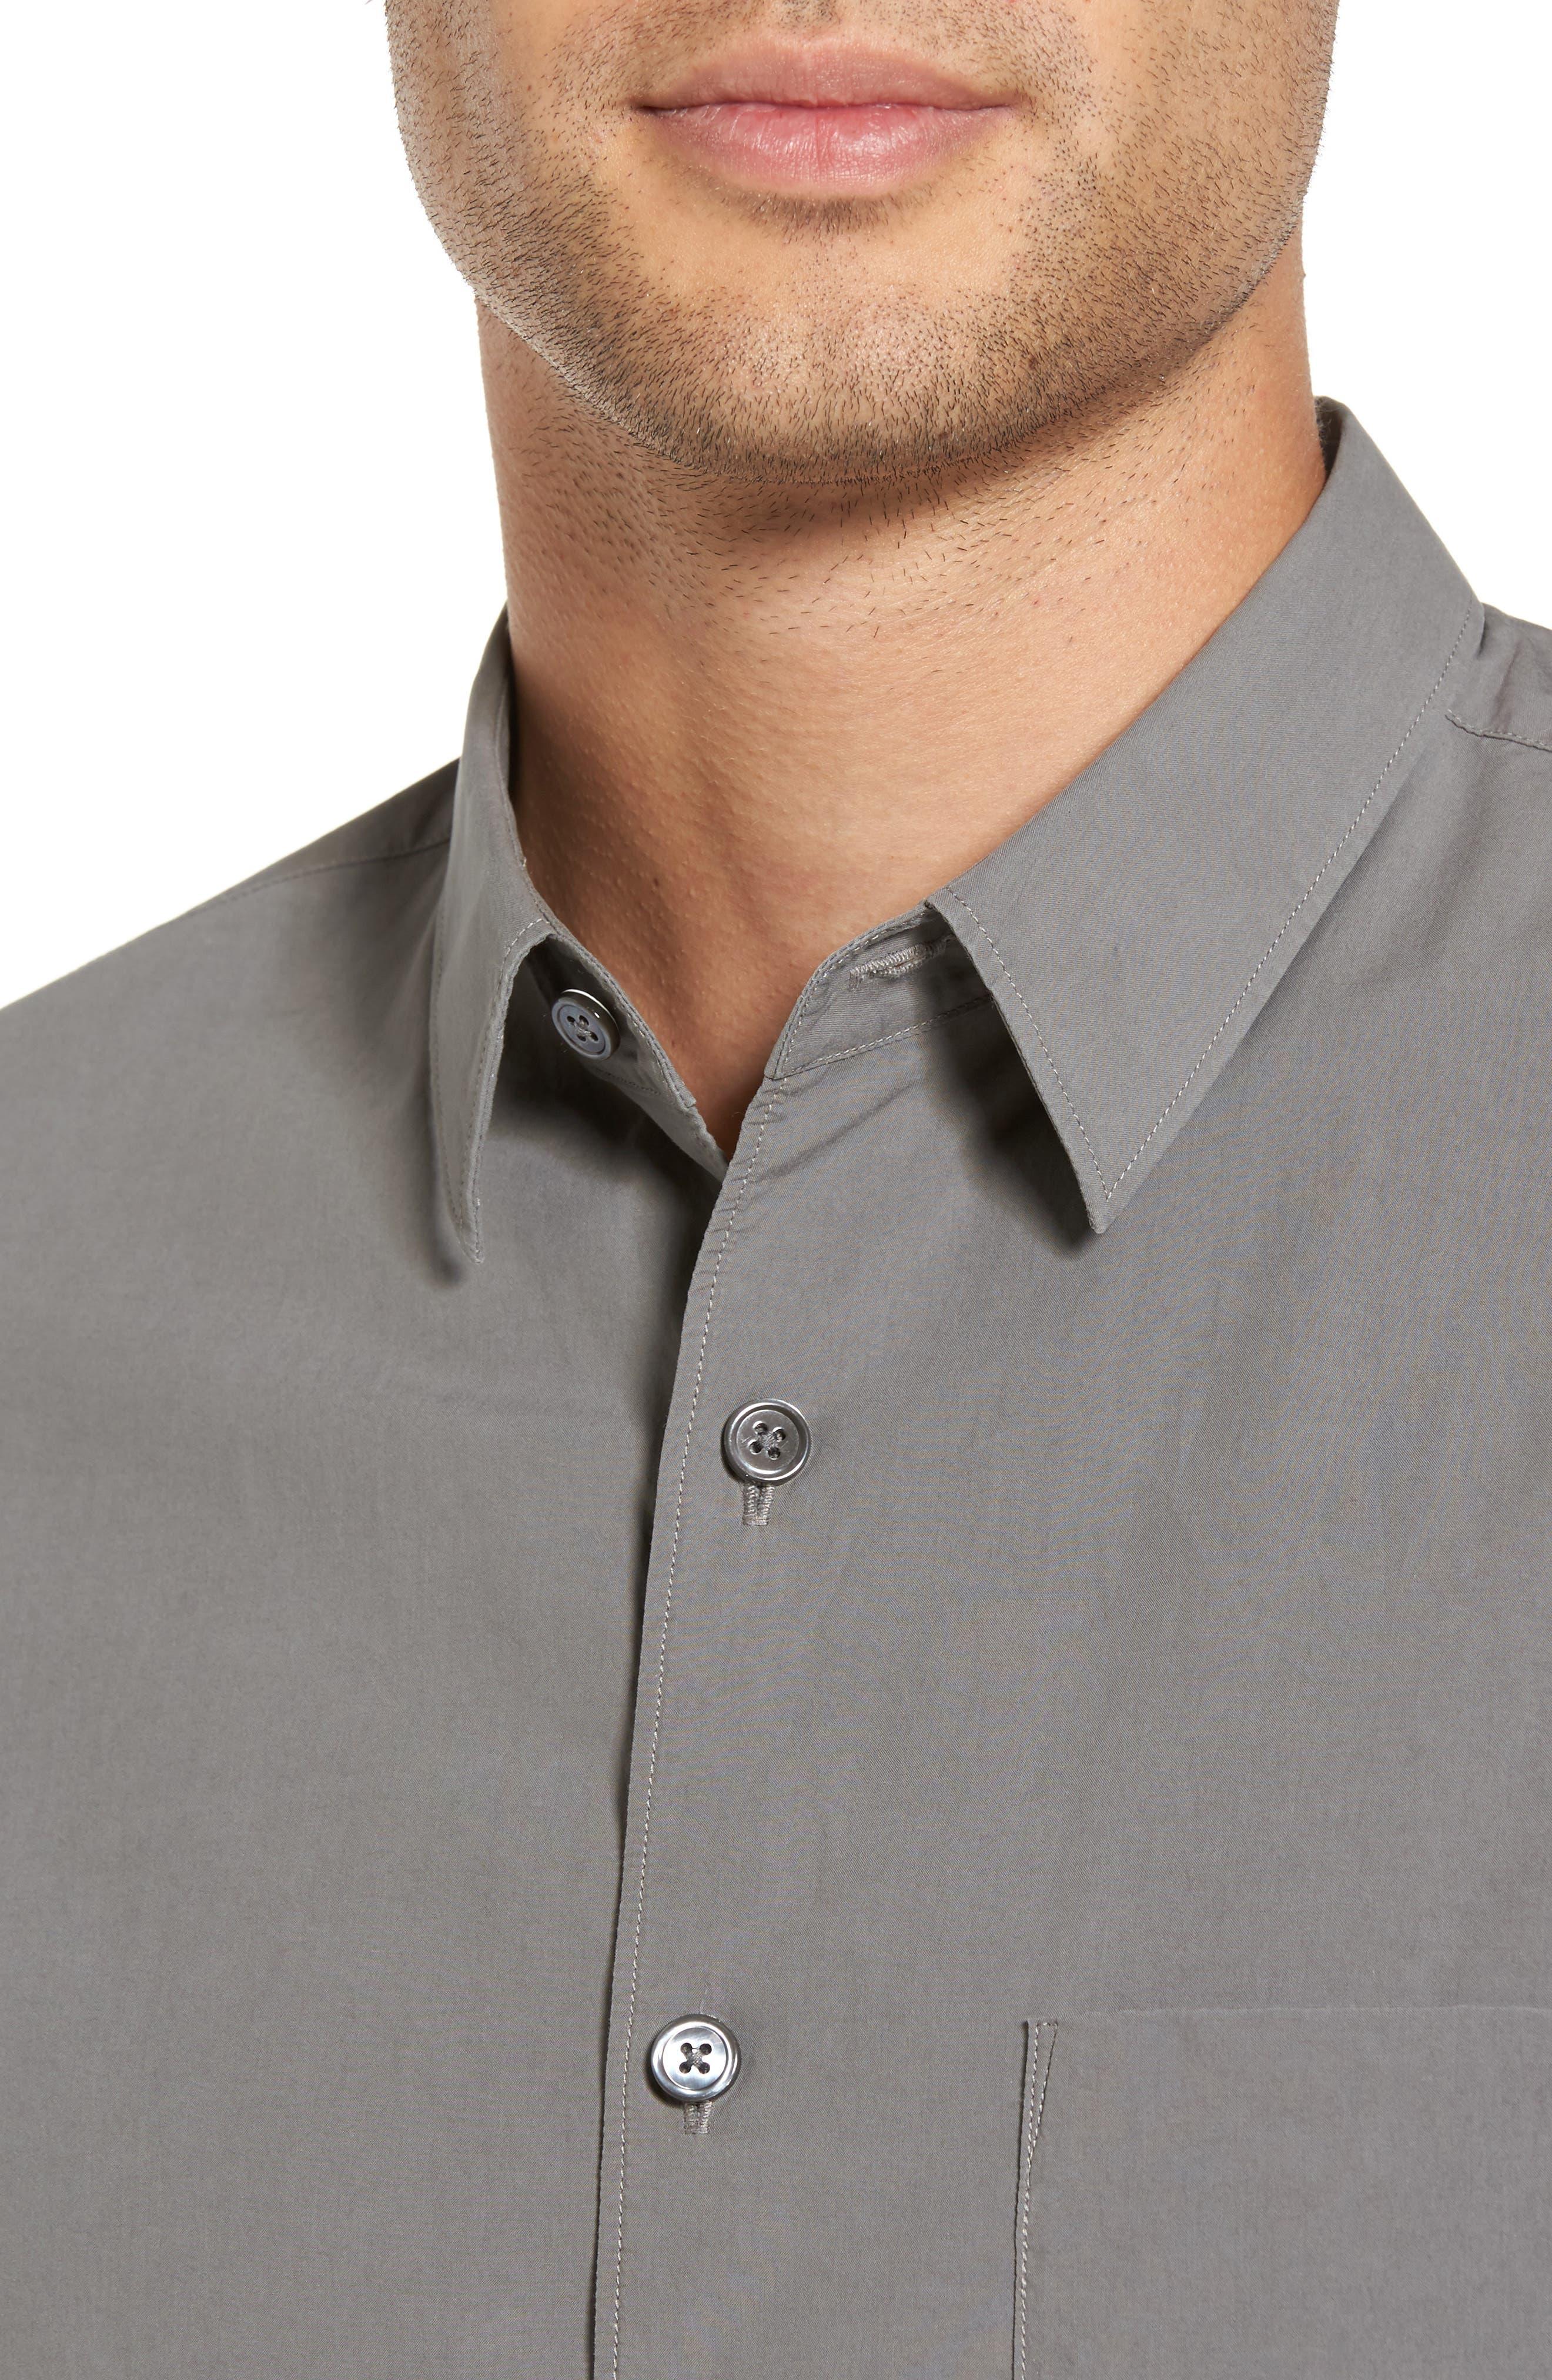 Rammy Trim Fit Solid Sport Shirt,                             Alternate thumbnail 4, color,                             020